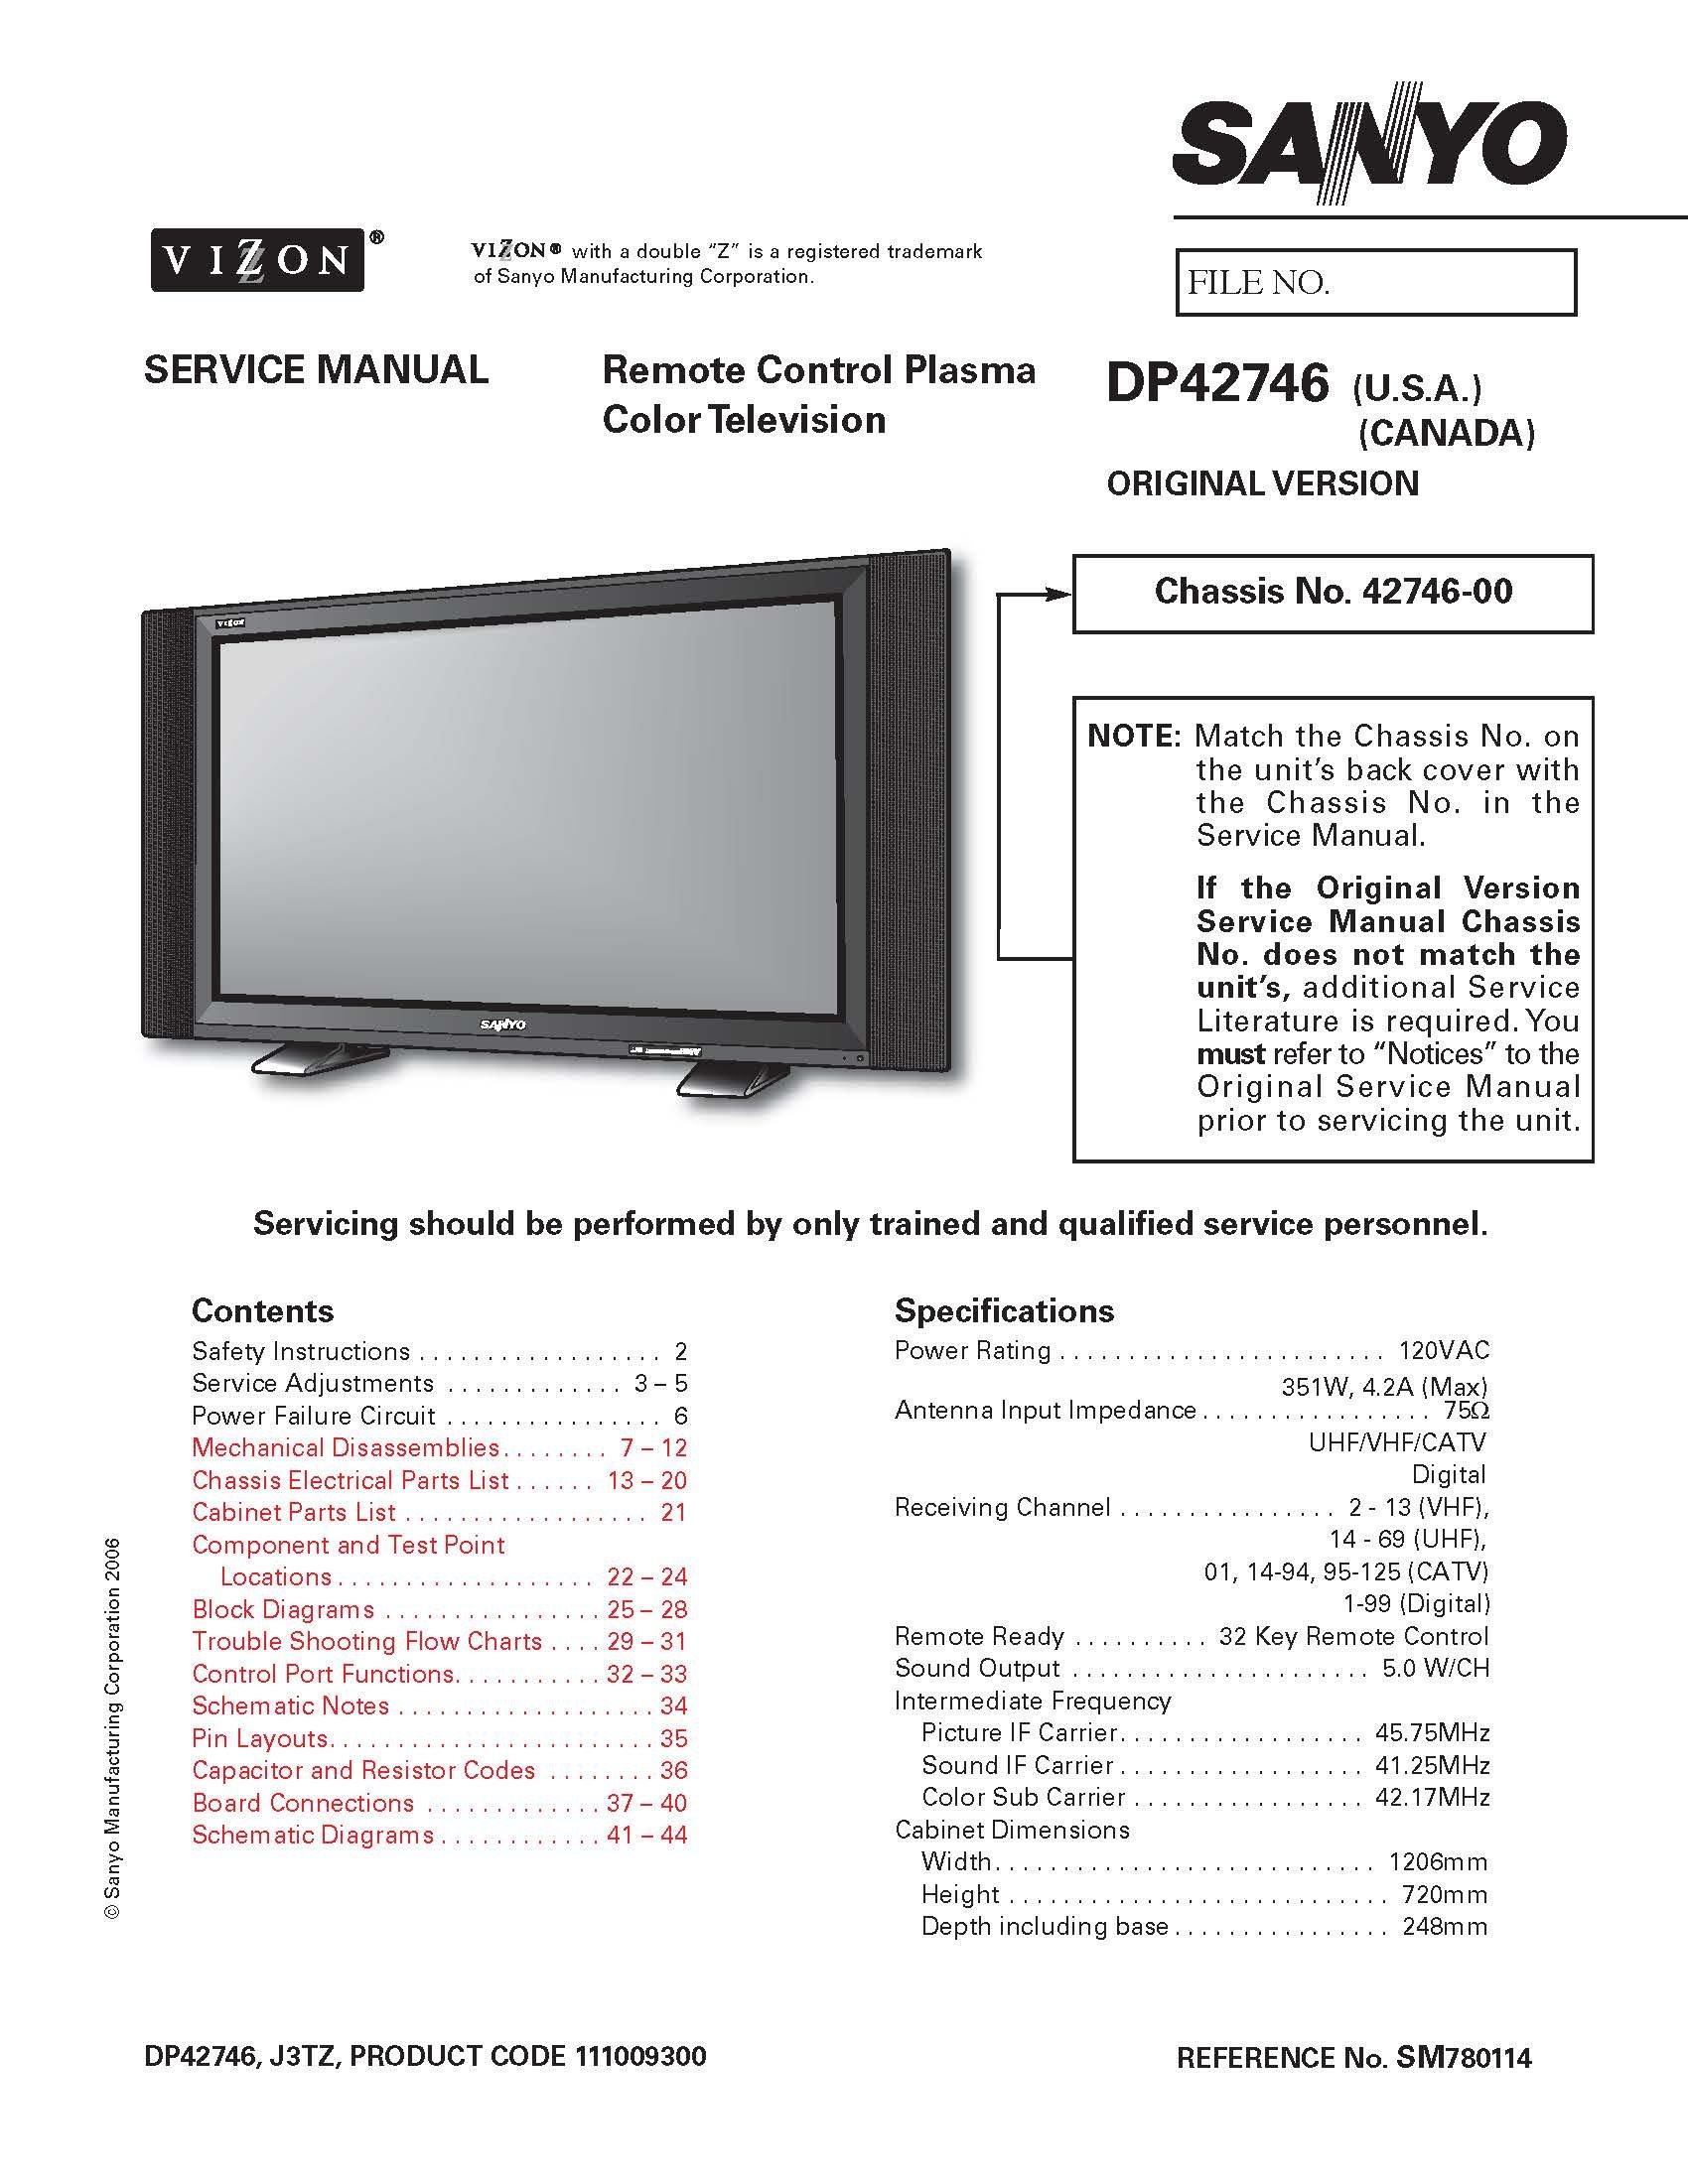 SANYO DP42746 service manual with schematics: SANYO: Amazon.com: Books